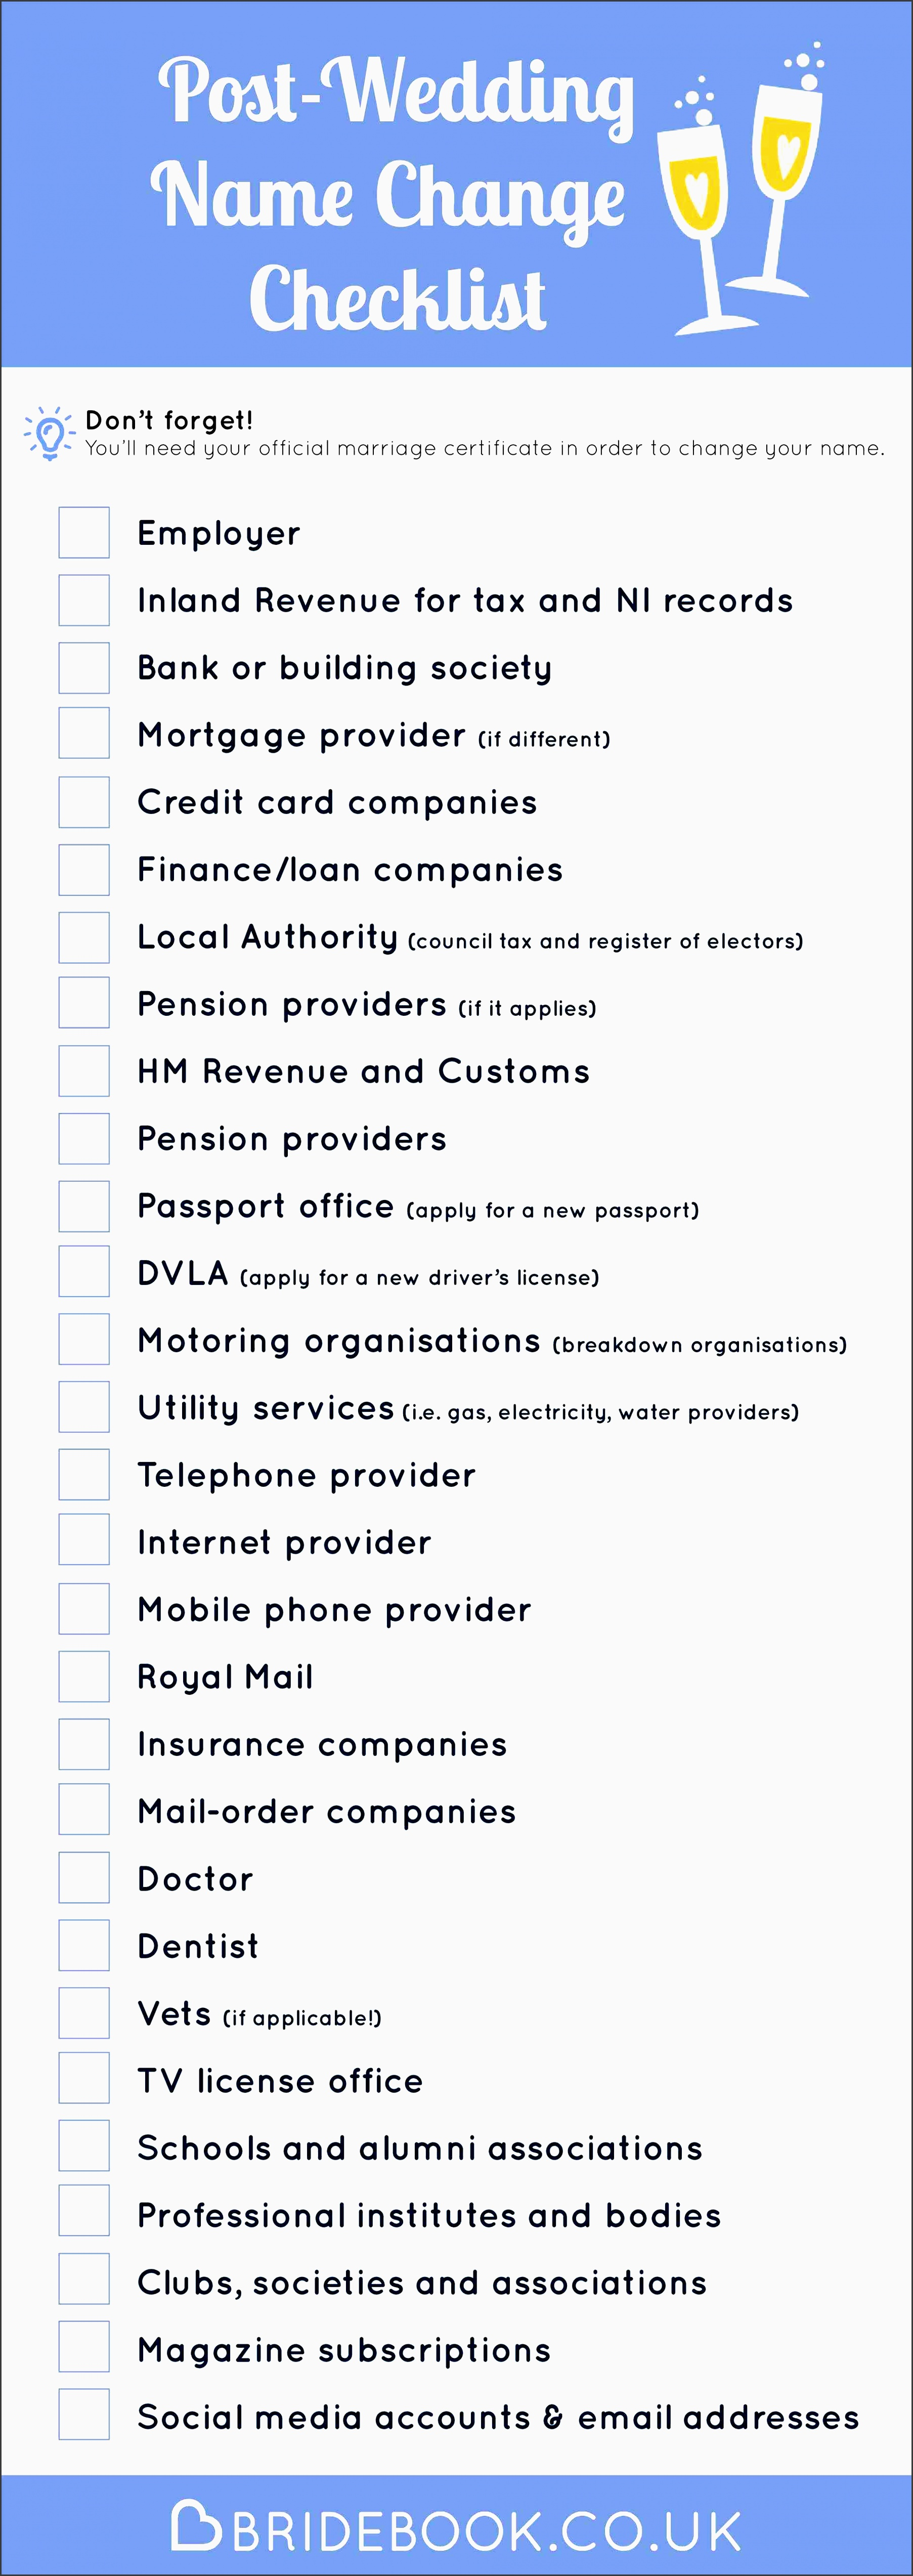 planning checklist template printable wedding planning checklist real advice gal wedding wedding planning checklist template checklist